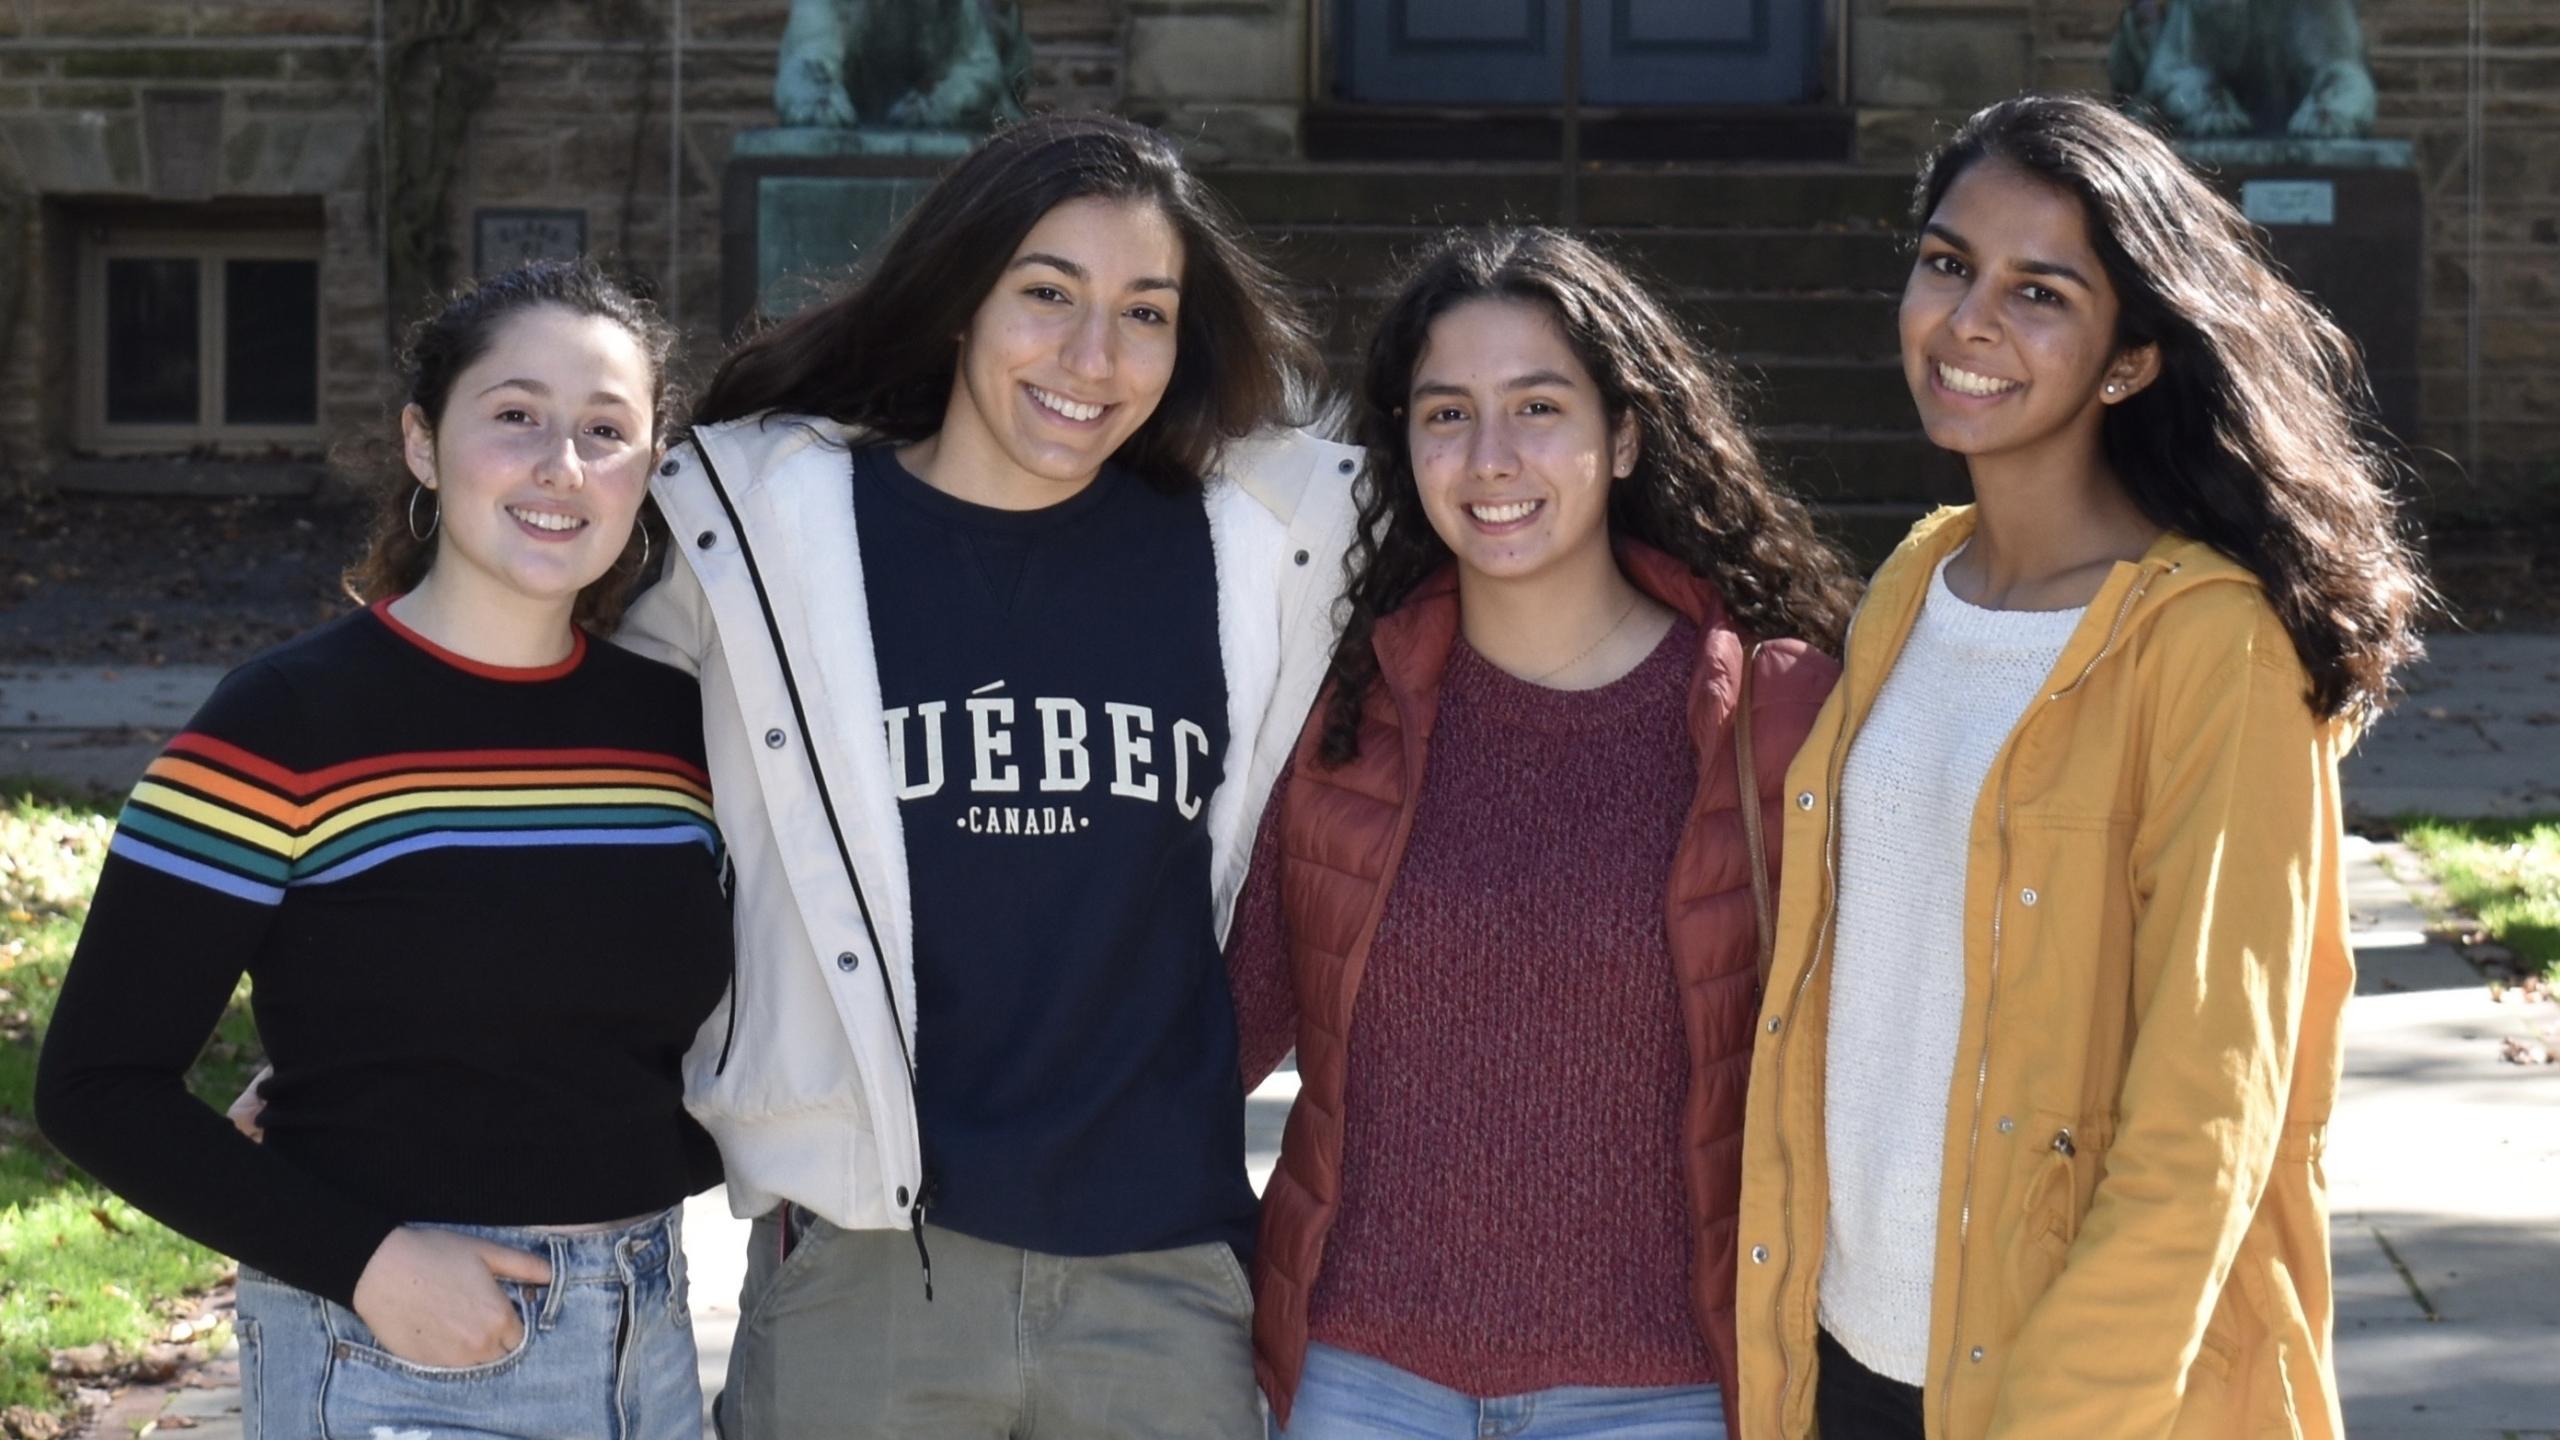 Anna Prilutsky, Eleni Retzepis, Franchesca Doell, and Anjali Kapoor